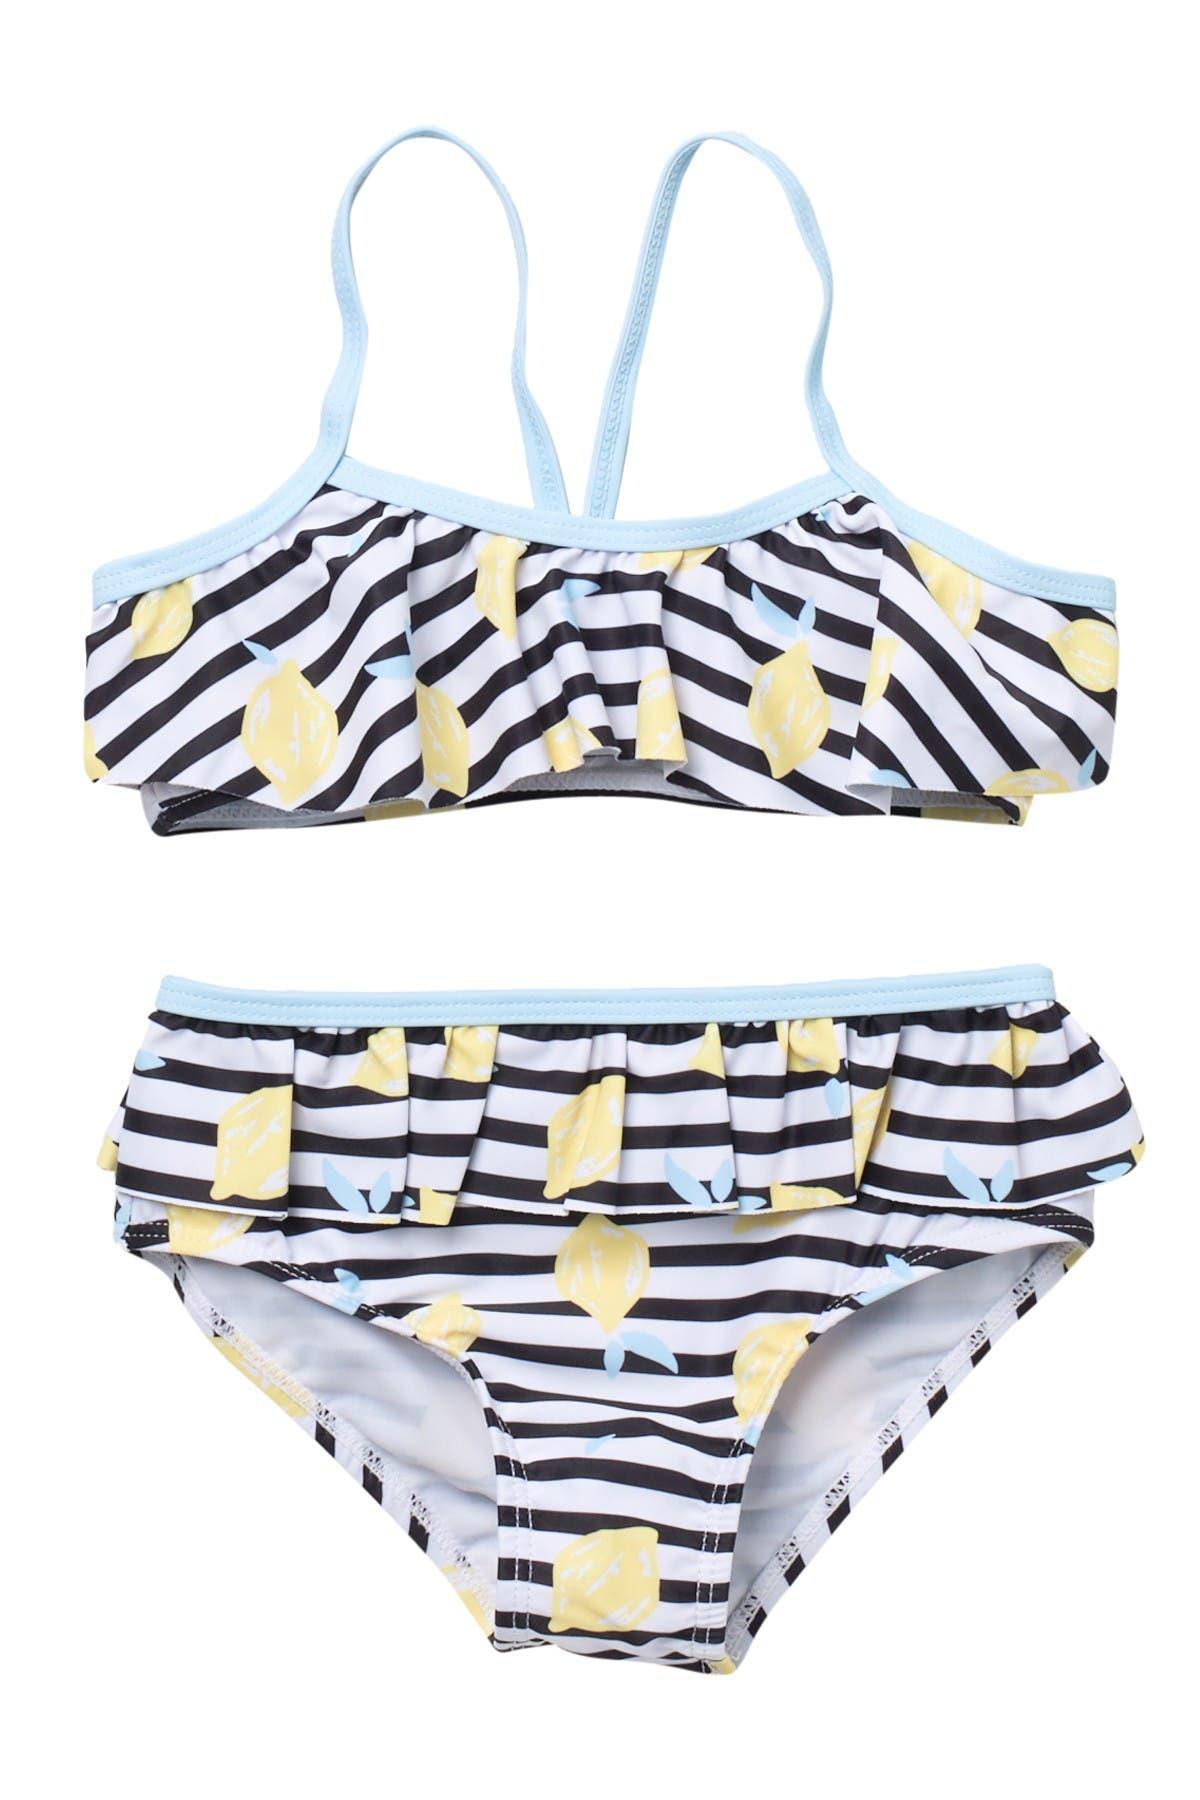 Image of Andy & Evan Stripe Lemon Two-Piece Swimsuit